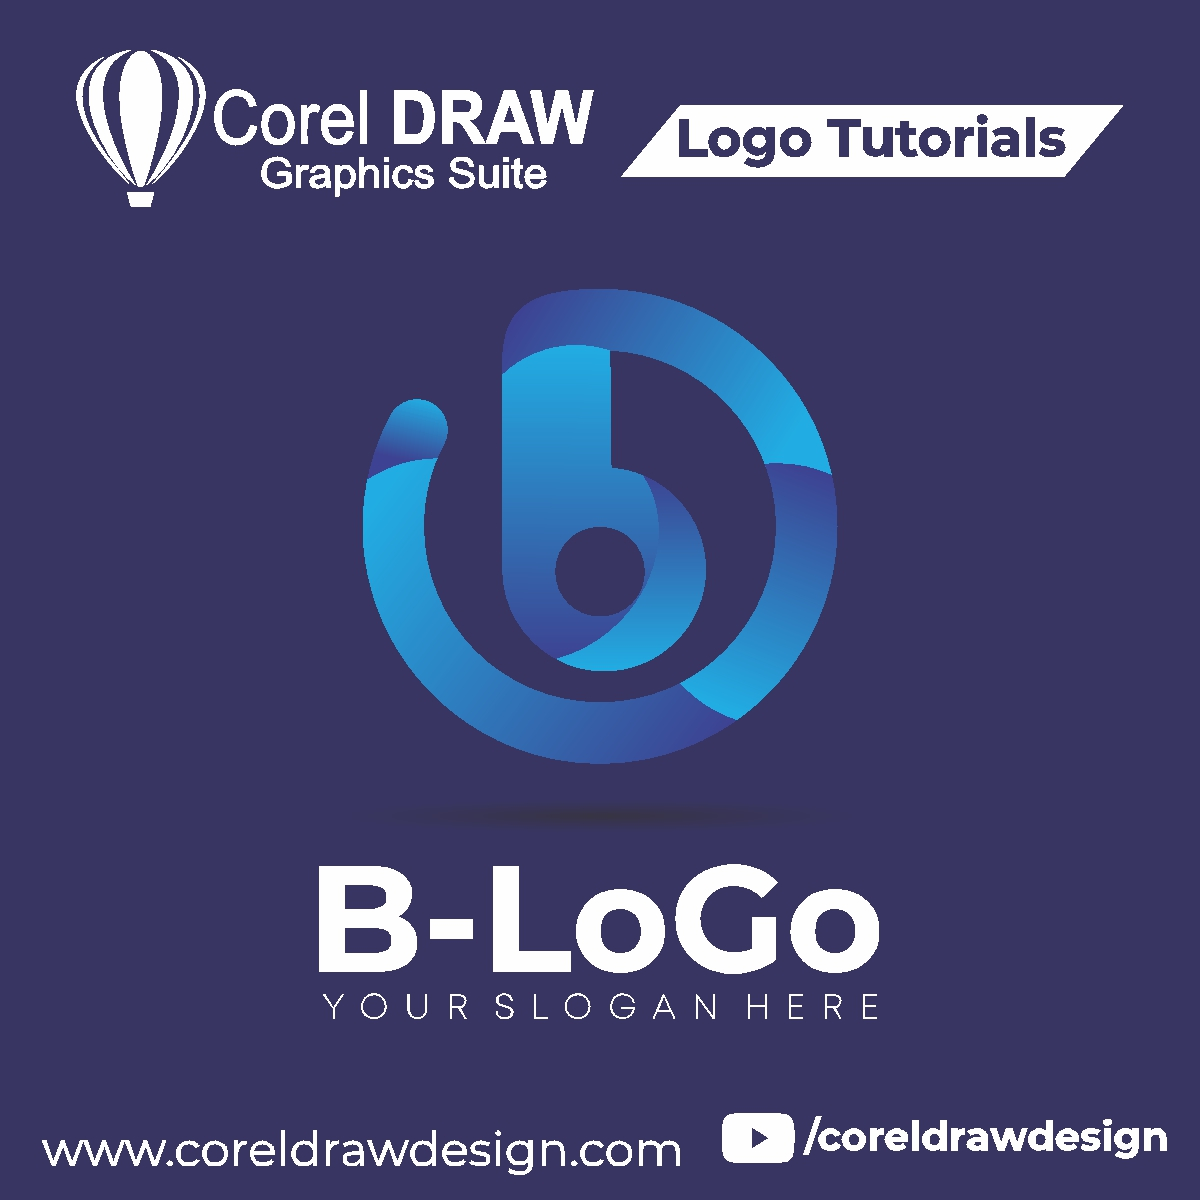 Best 3D Logo Tutorial - Logo Design - Digital Graphics - Tutorial - Coreldraw for Beginners